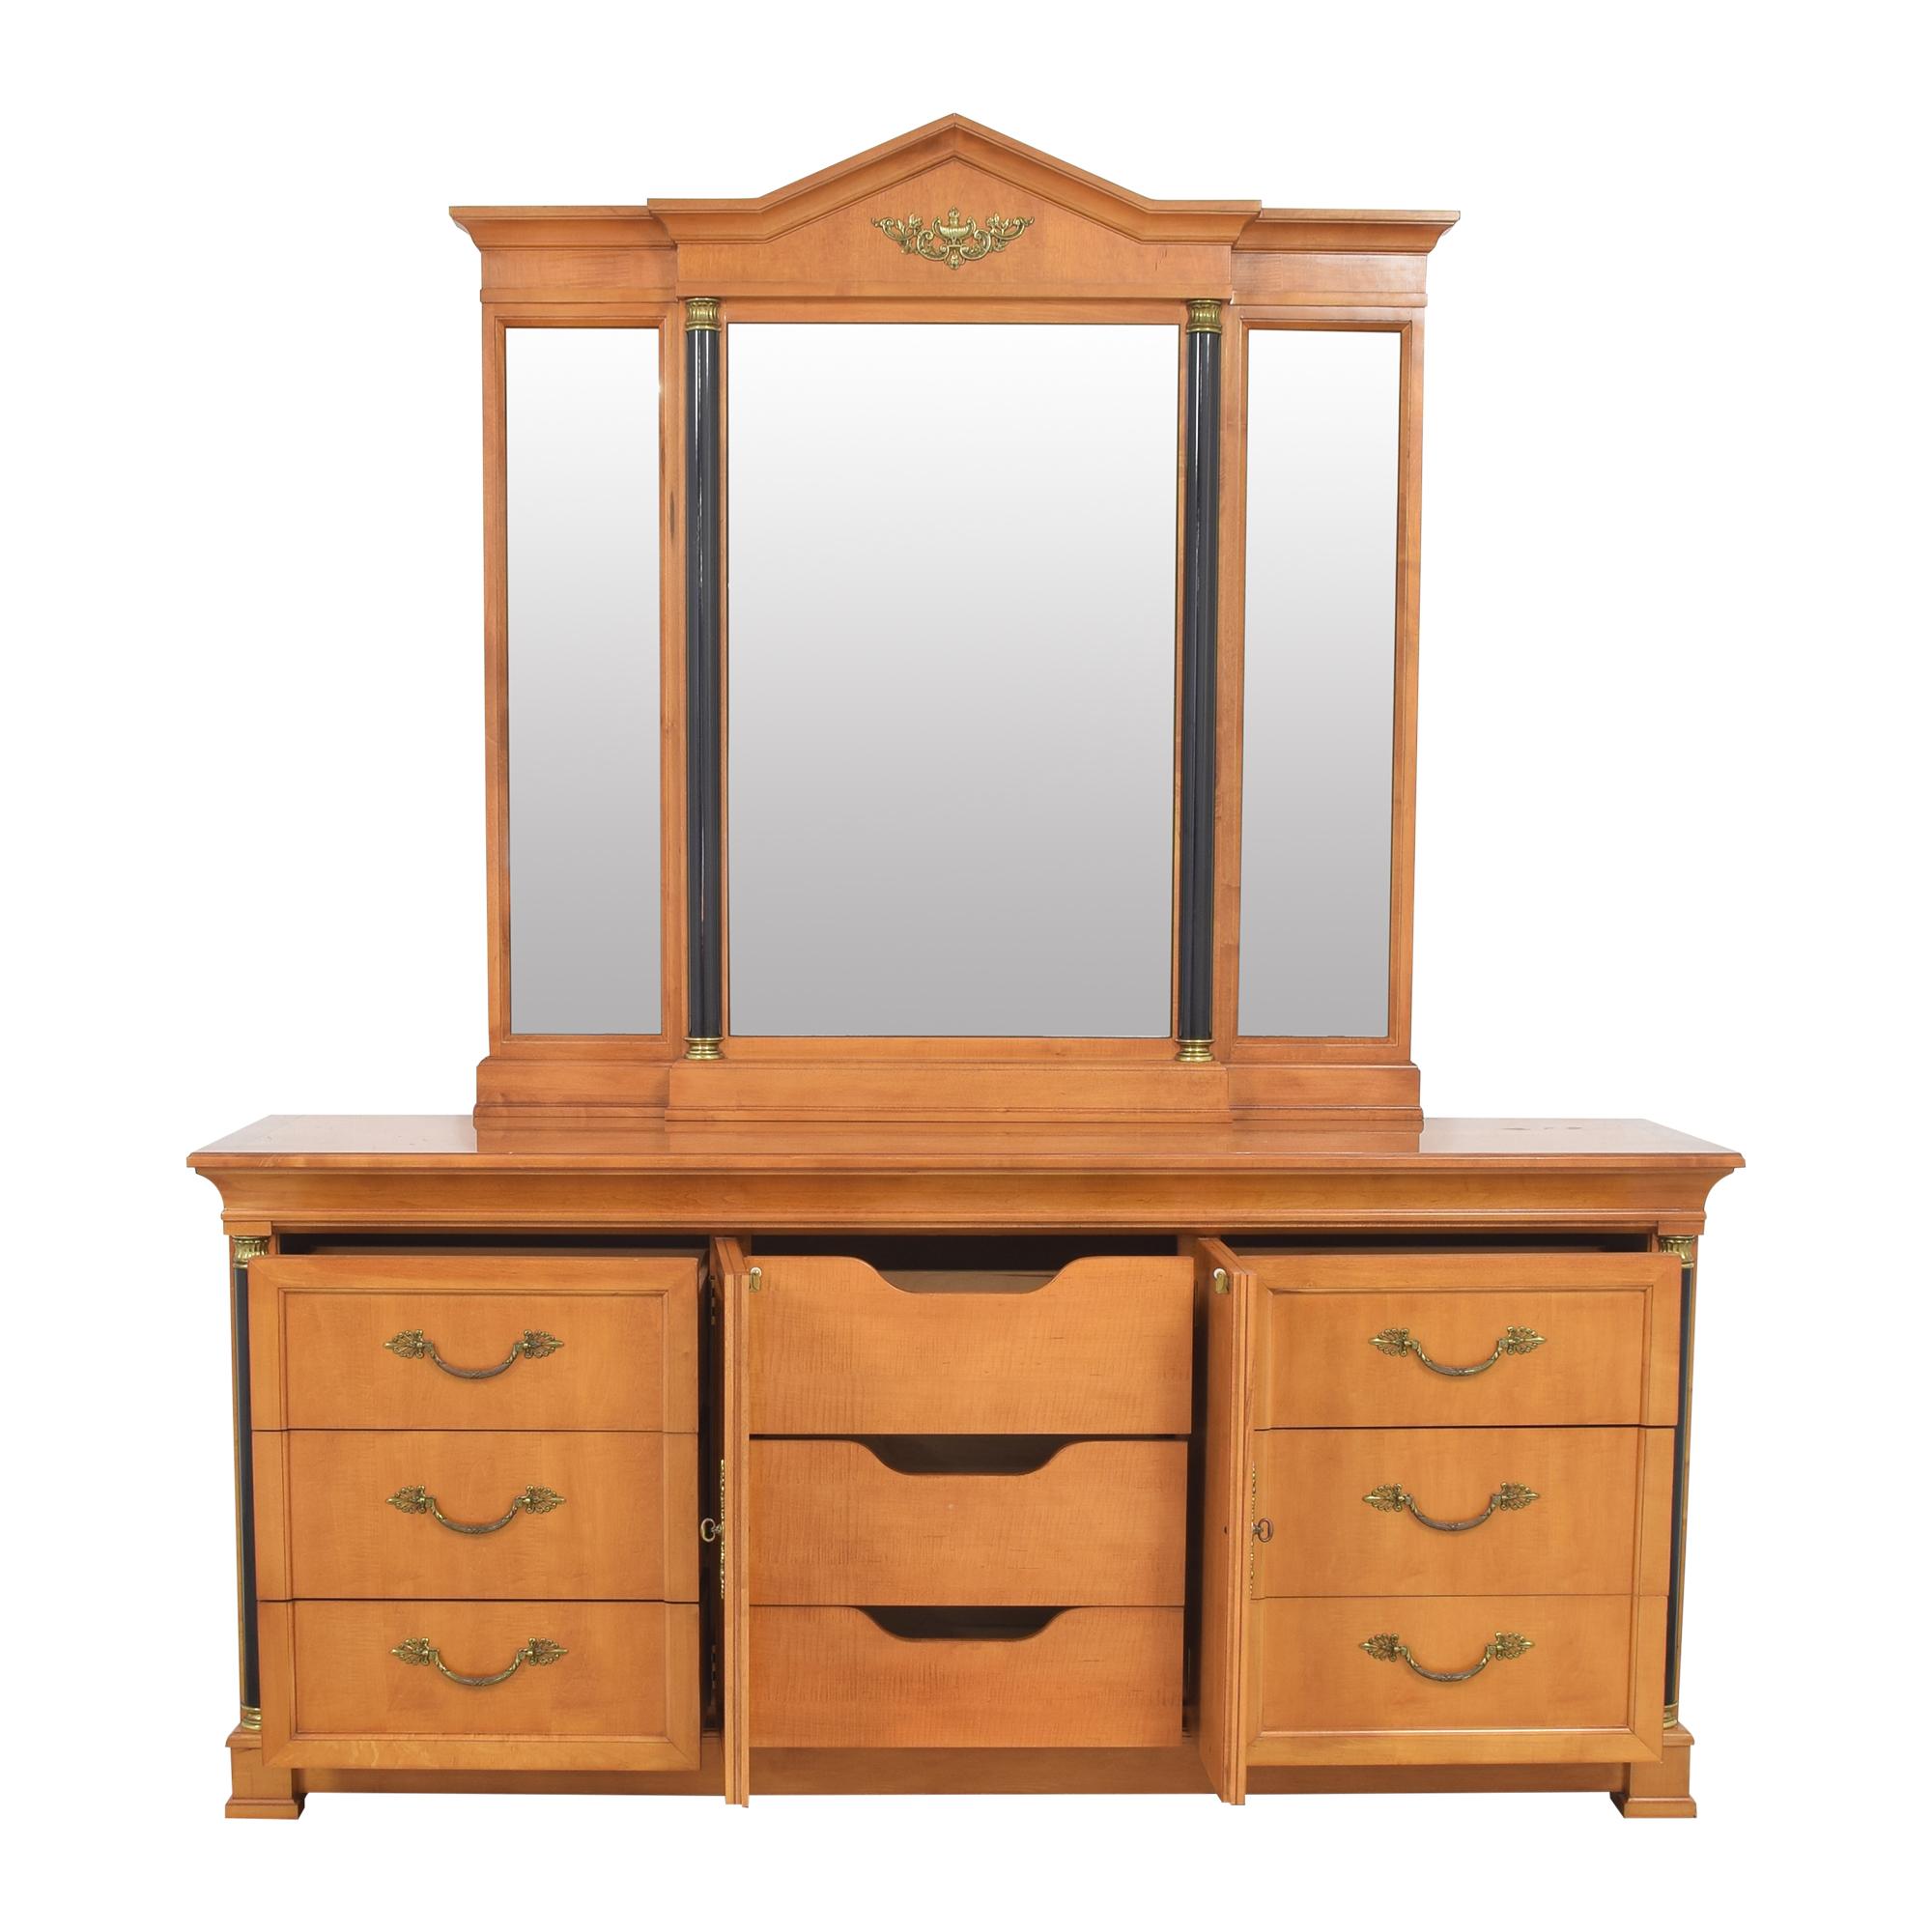 Thomasville Grand Classics Biedermeier Triple Dresser with Mirror / Dressers